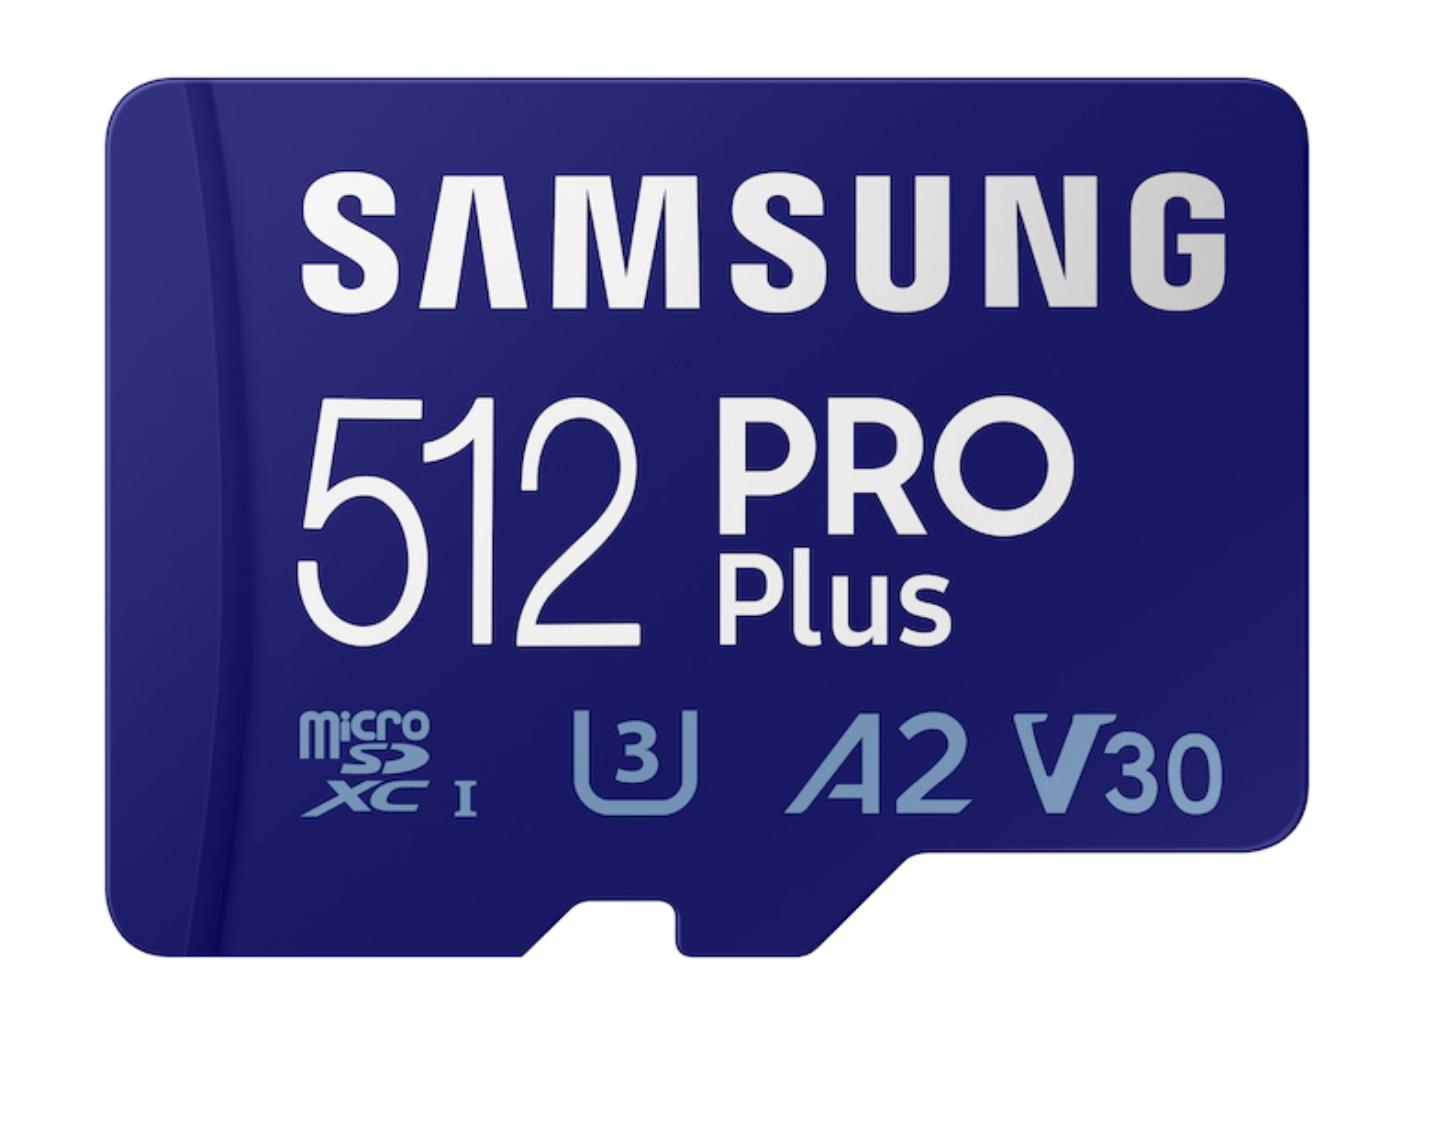 Samsung EVO PRO Plus microSDXC Card + Adapter